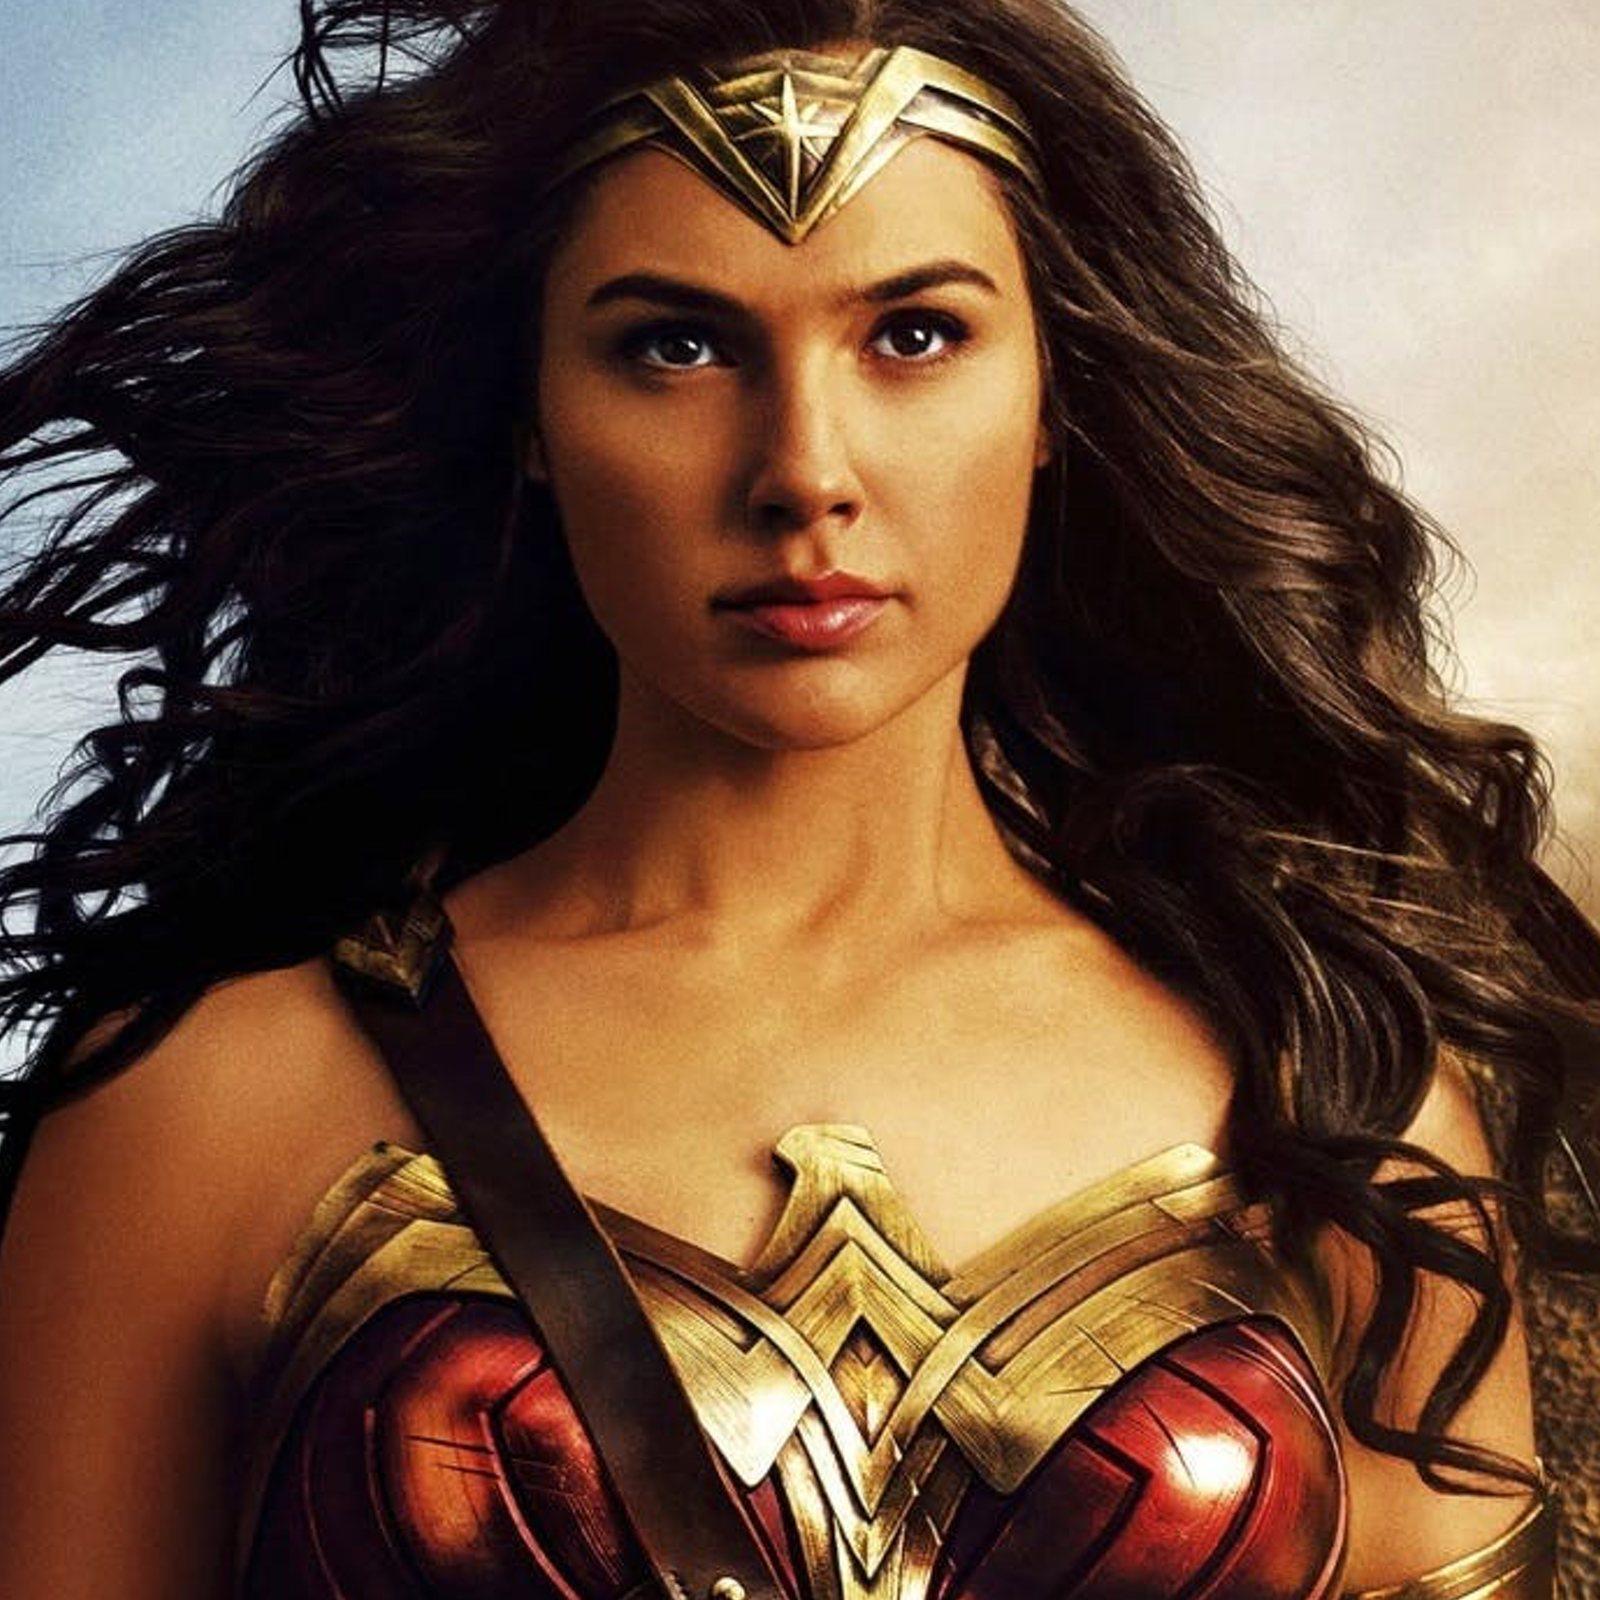 Wonder Woman (2017) Phone Wallpaper   Moviemania